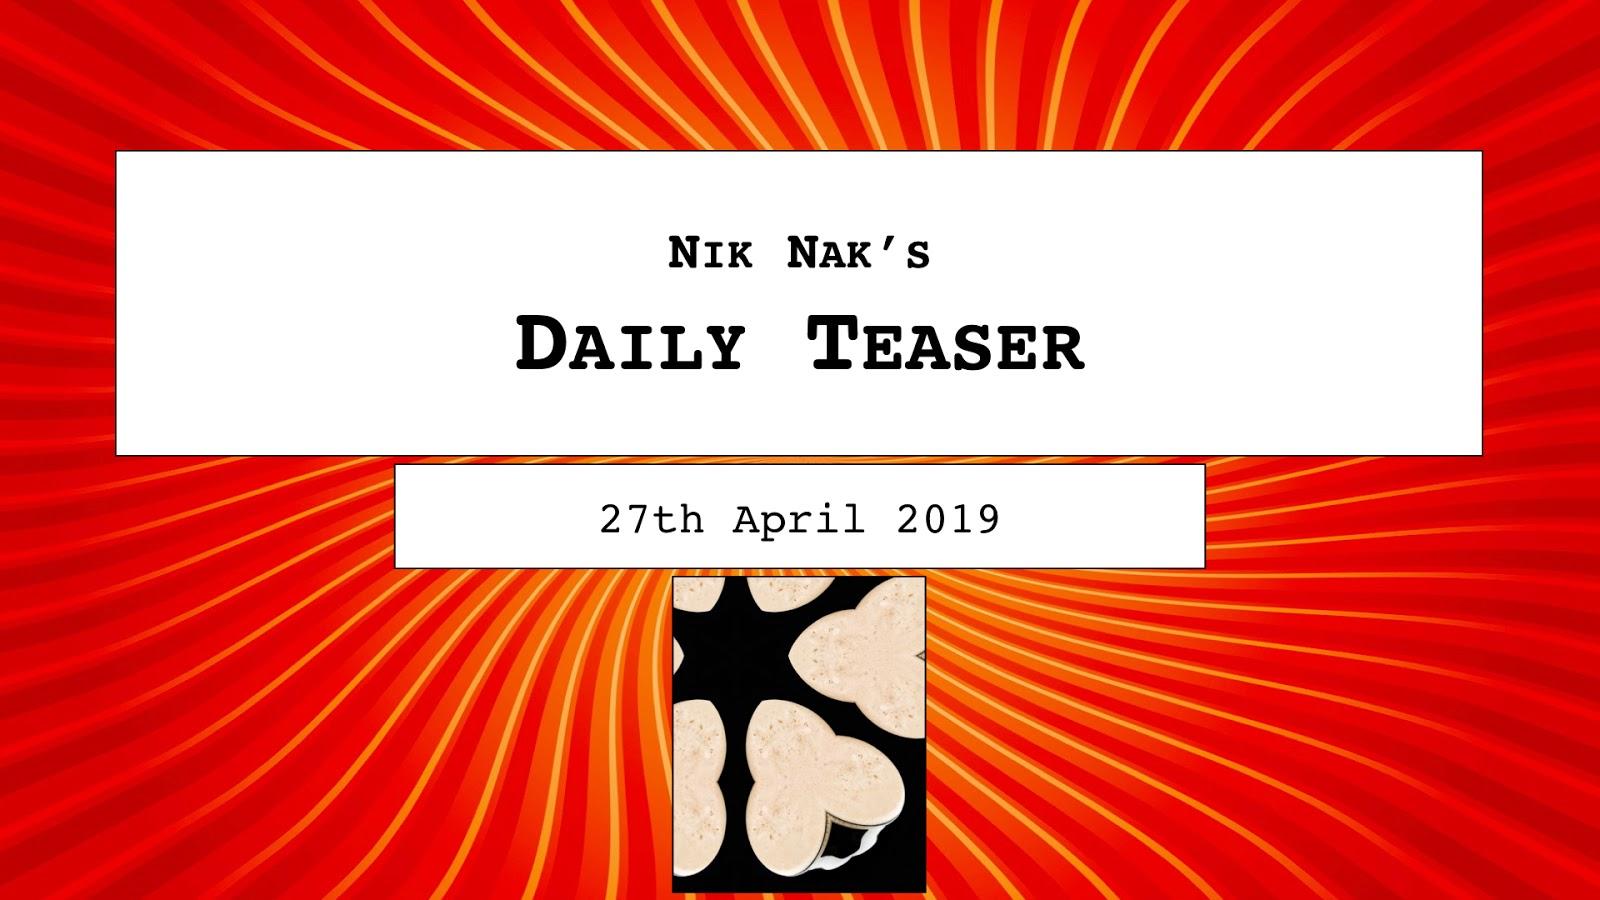 37951c3bb Nik Nak's Old Peculiar: Nik Nak's Daily Teaser — 27th April, 2019